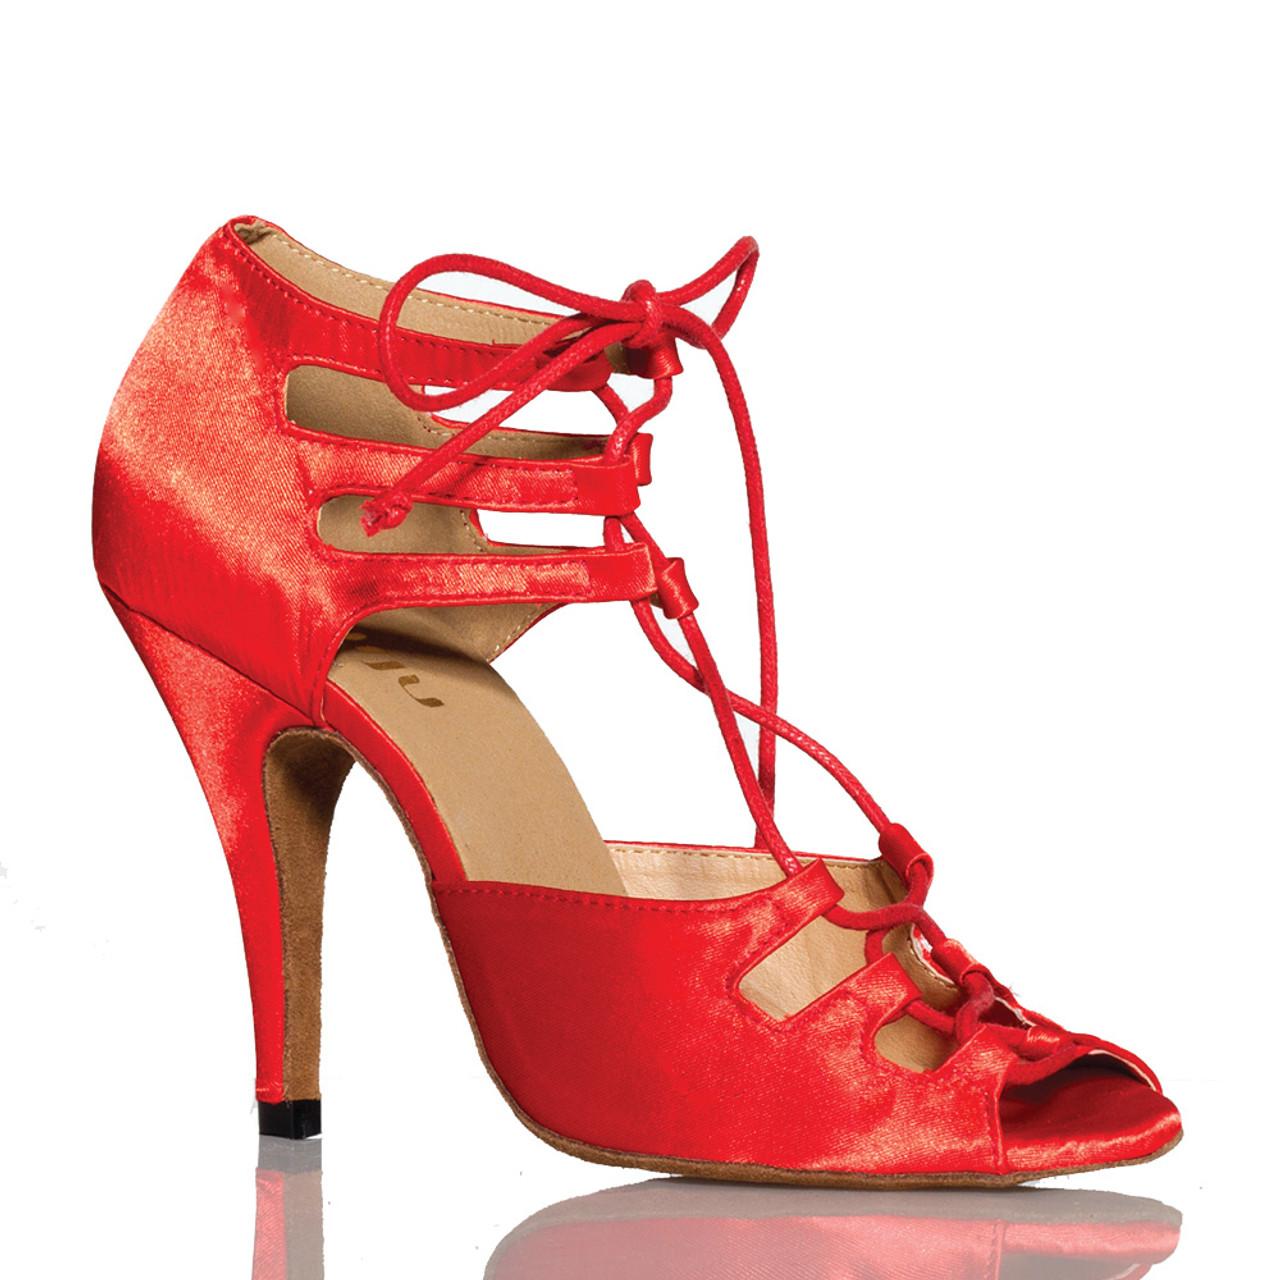 9c95b738779 Alemana - Red Satin Open Toe Lace Up Stiletto Dance Shoe - 4 inch Heels -  Burju Shoes